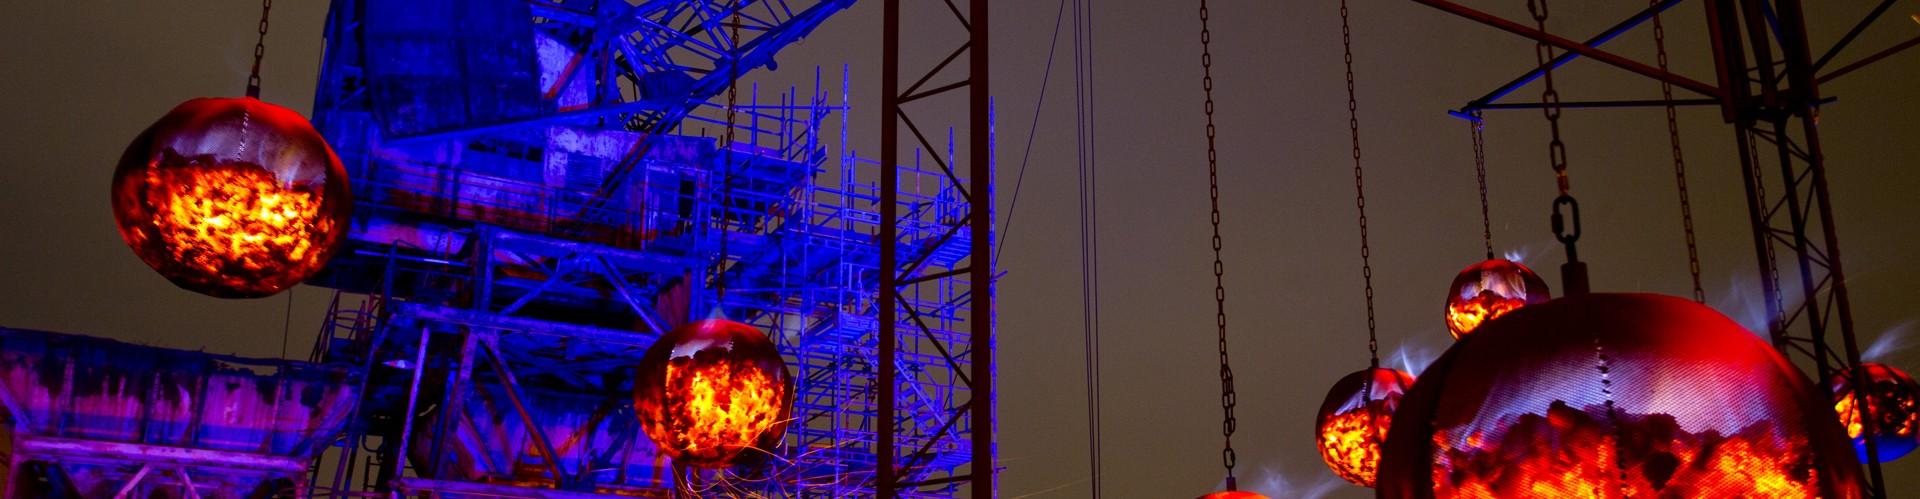 battersea-power-station-e1434968613504